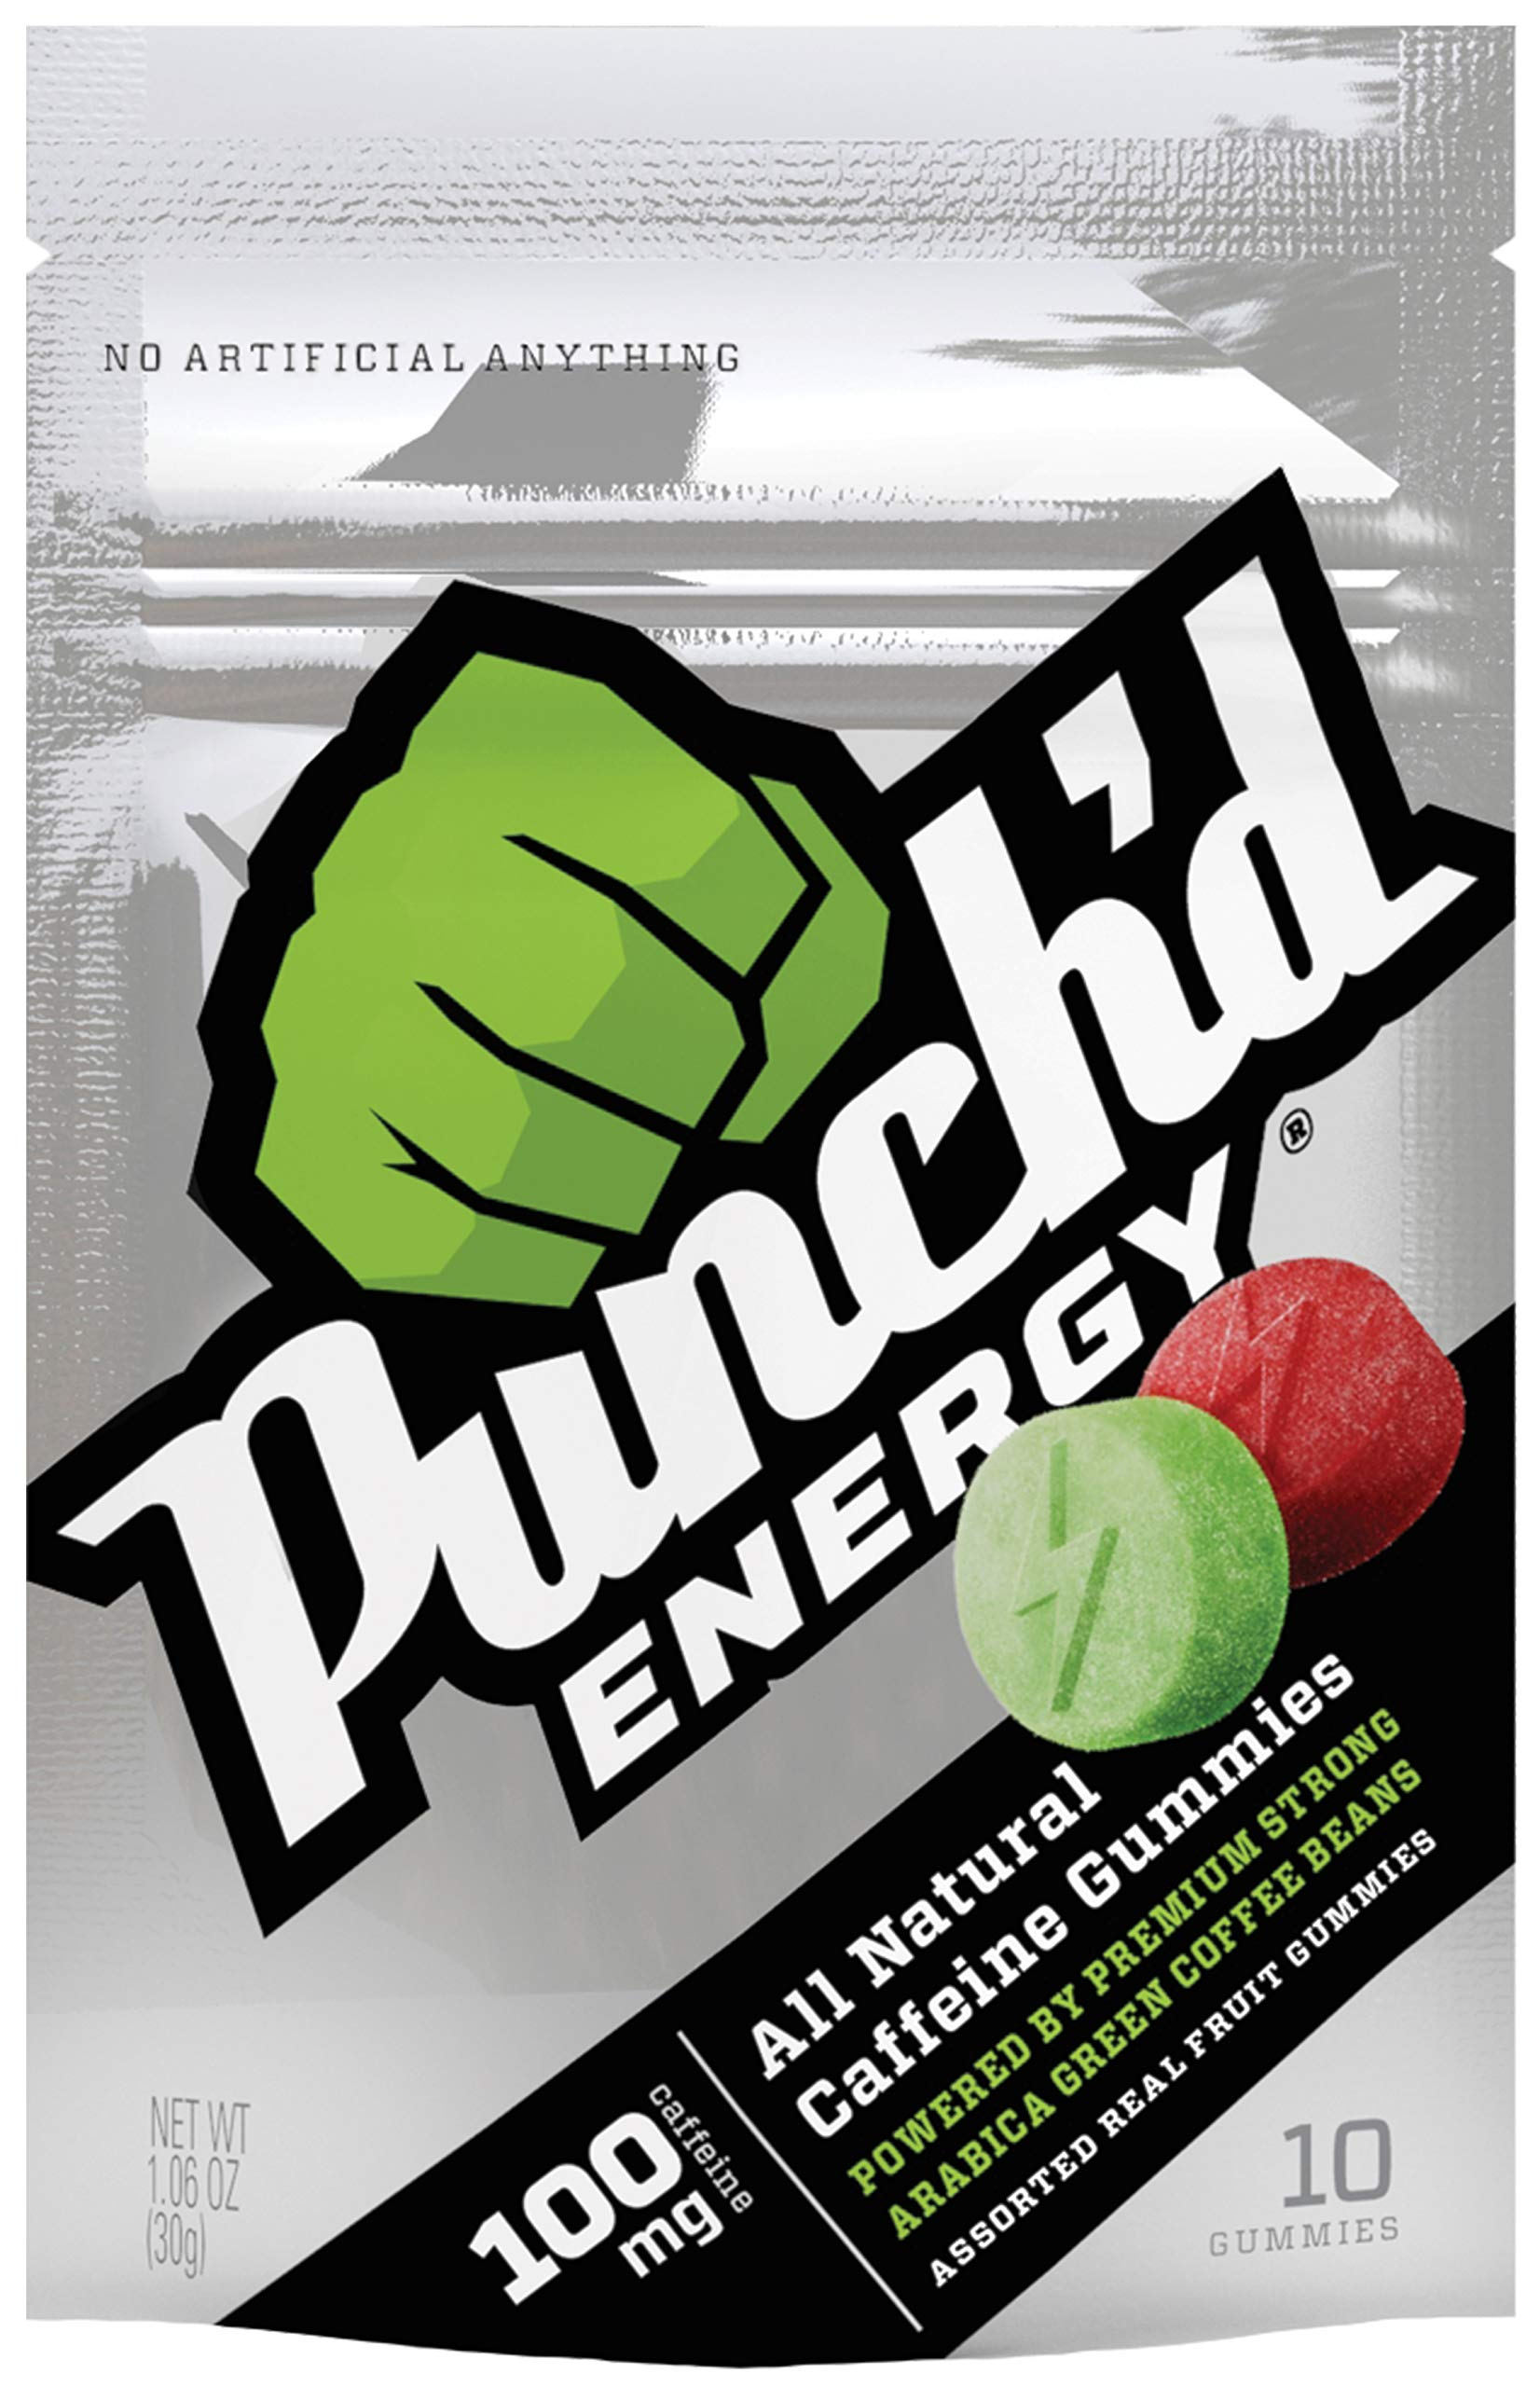 10-PACK Punch'd Energy Natural Caffeine Gummies. Premium Strong Arabica Green Coffee Bean infused Super-Fruity Gummies w/Vitamin C. #getpunchd Go You!